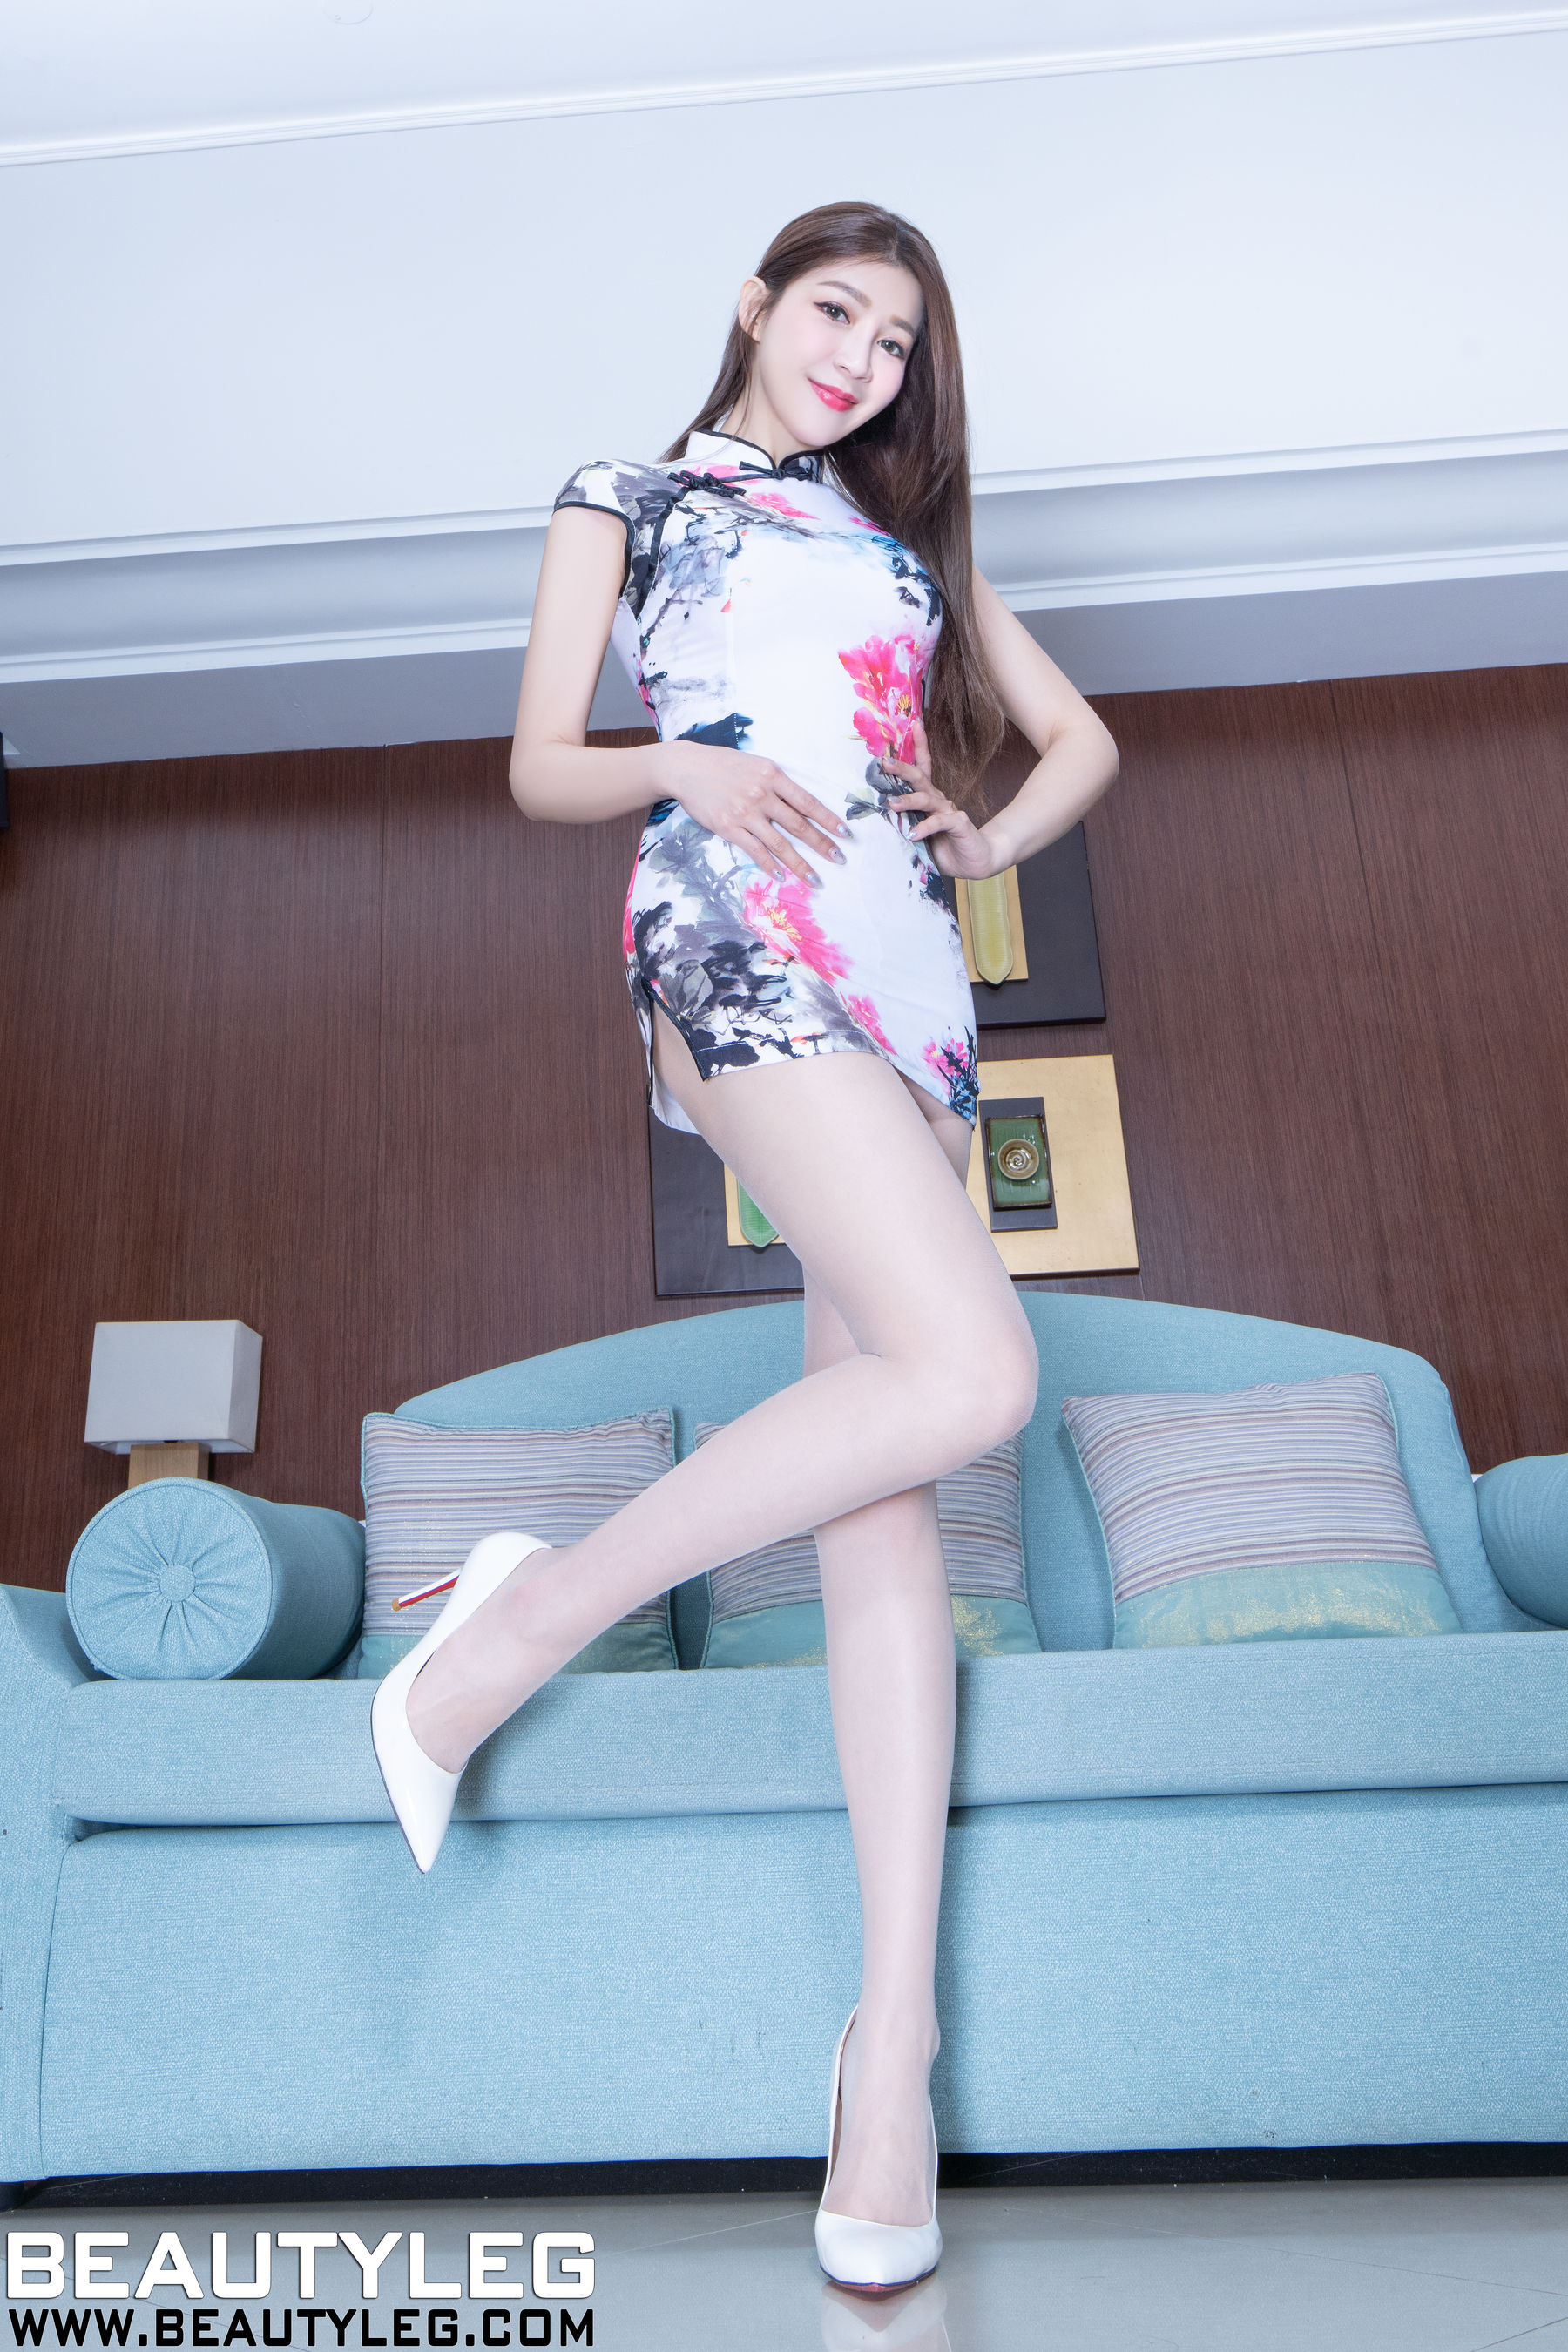 VOL.1514 [Beautyleg]肉丝美腿:腿模Annie(Beautyleg Annie)高品质写真套图(35P)